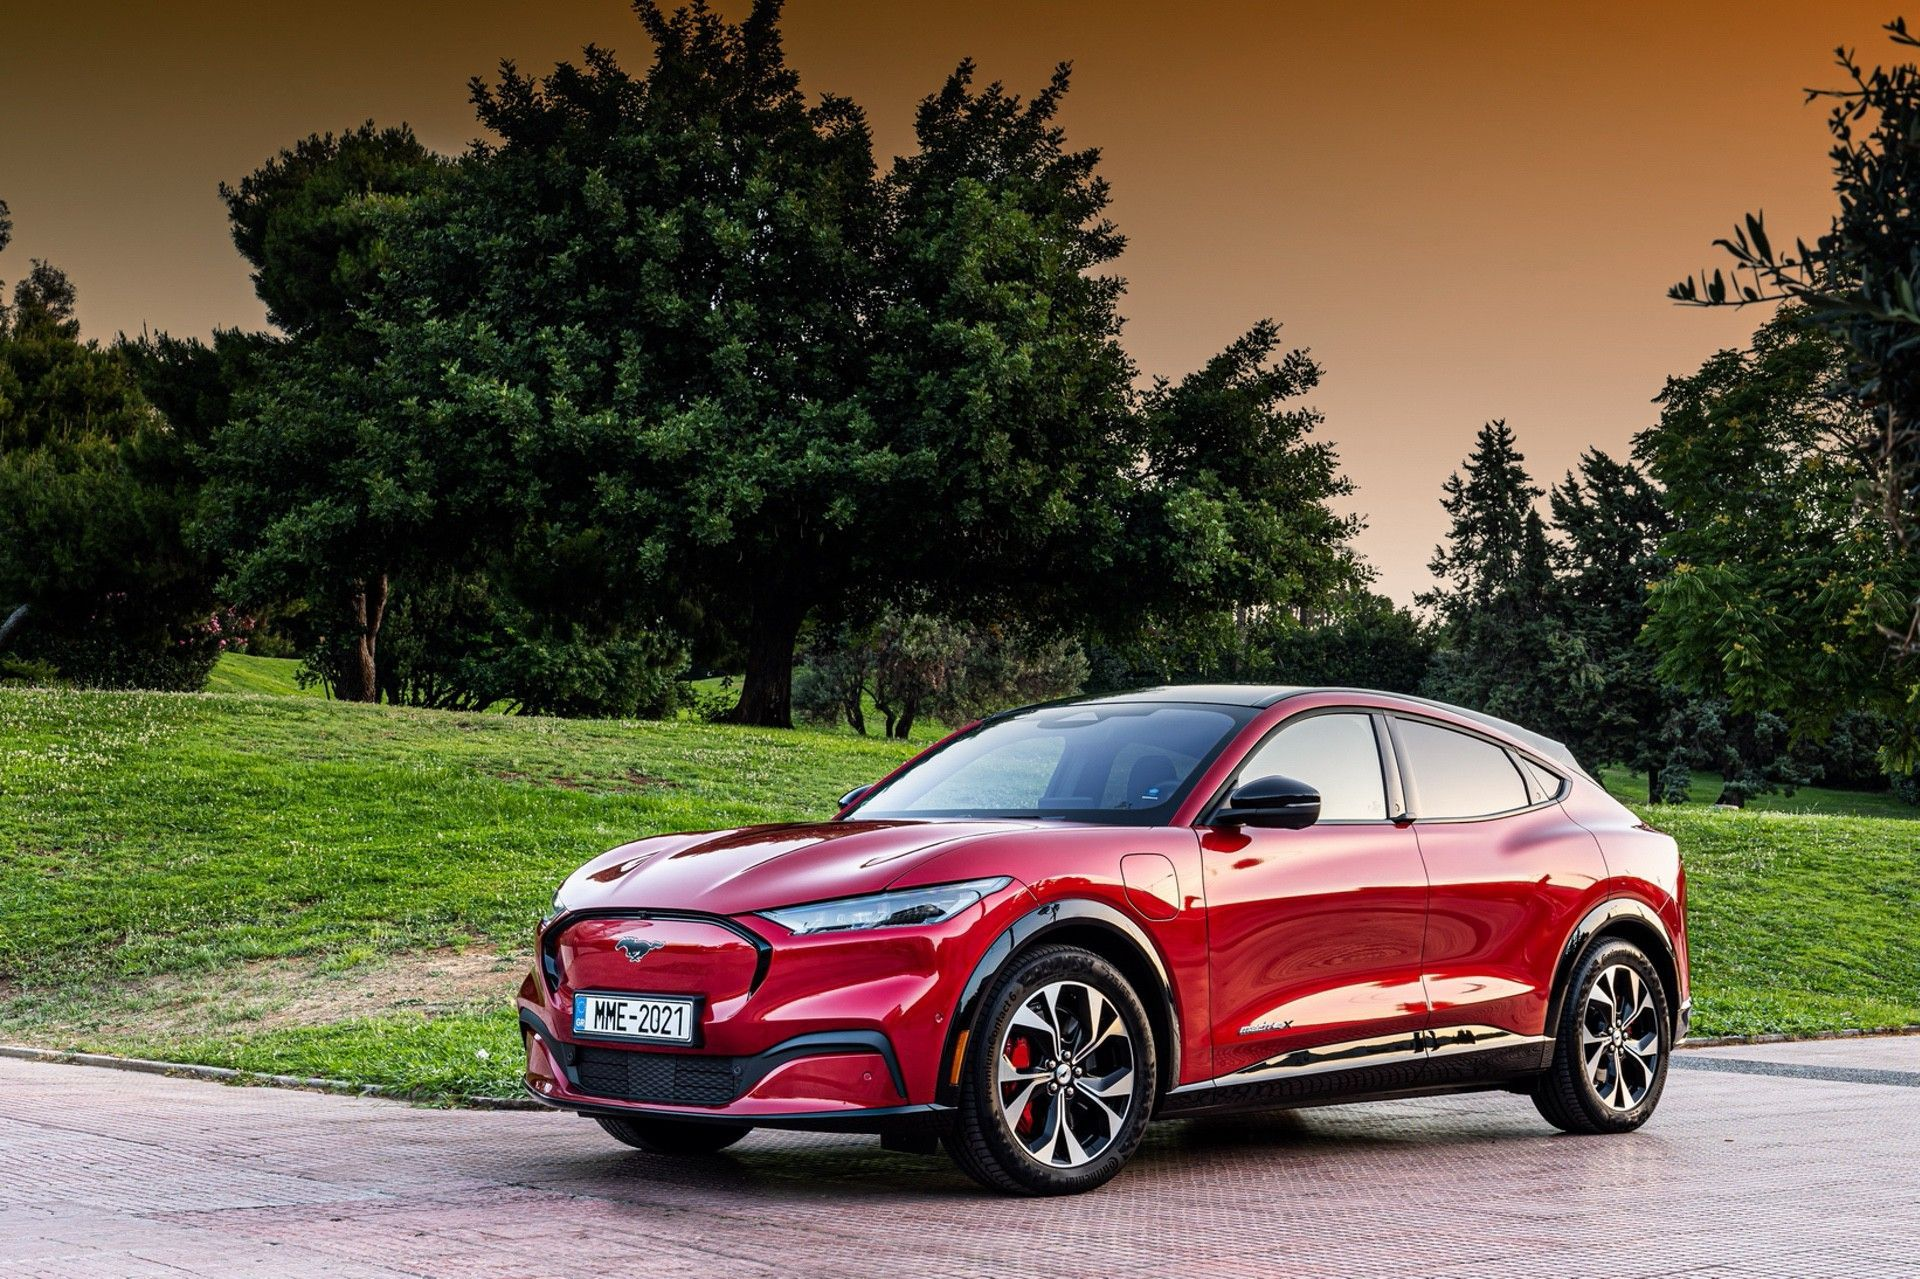 Ford_Mustang_Mach-E_greek_presskit-0002